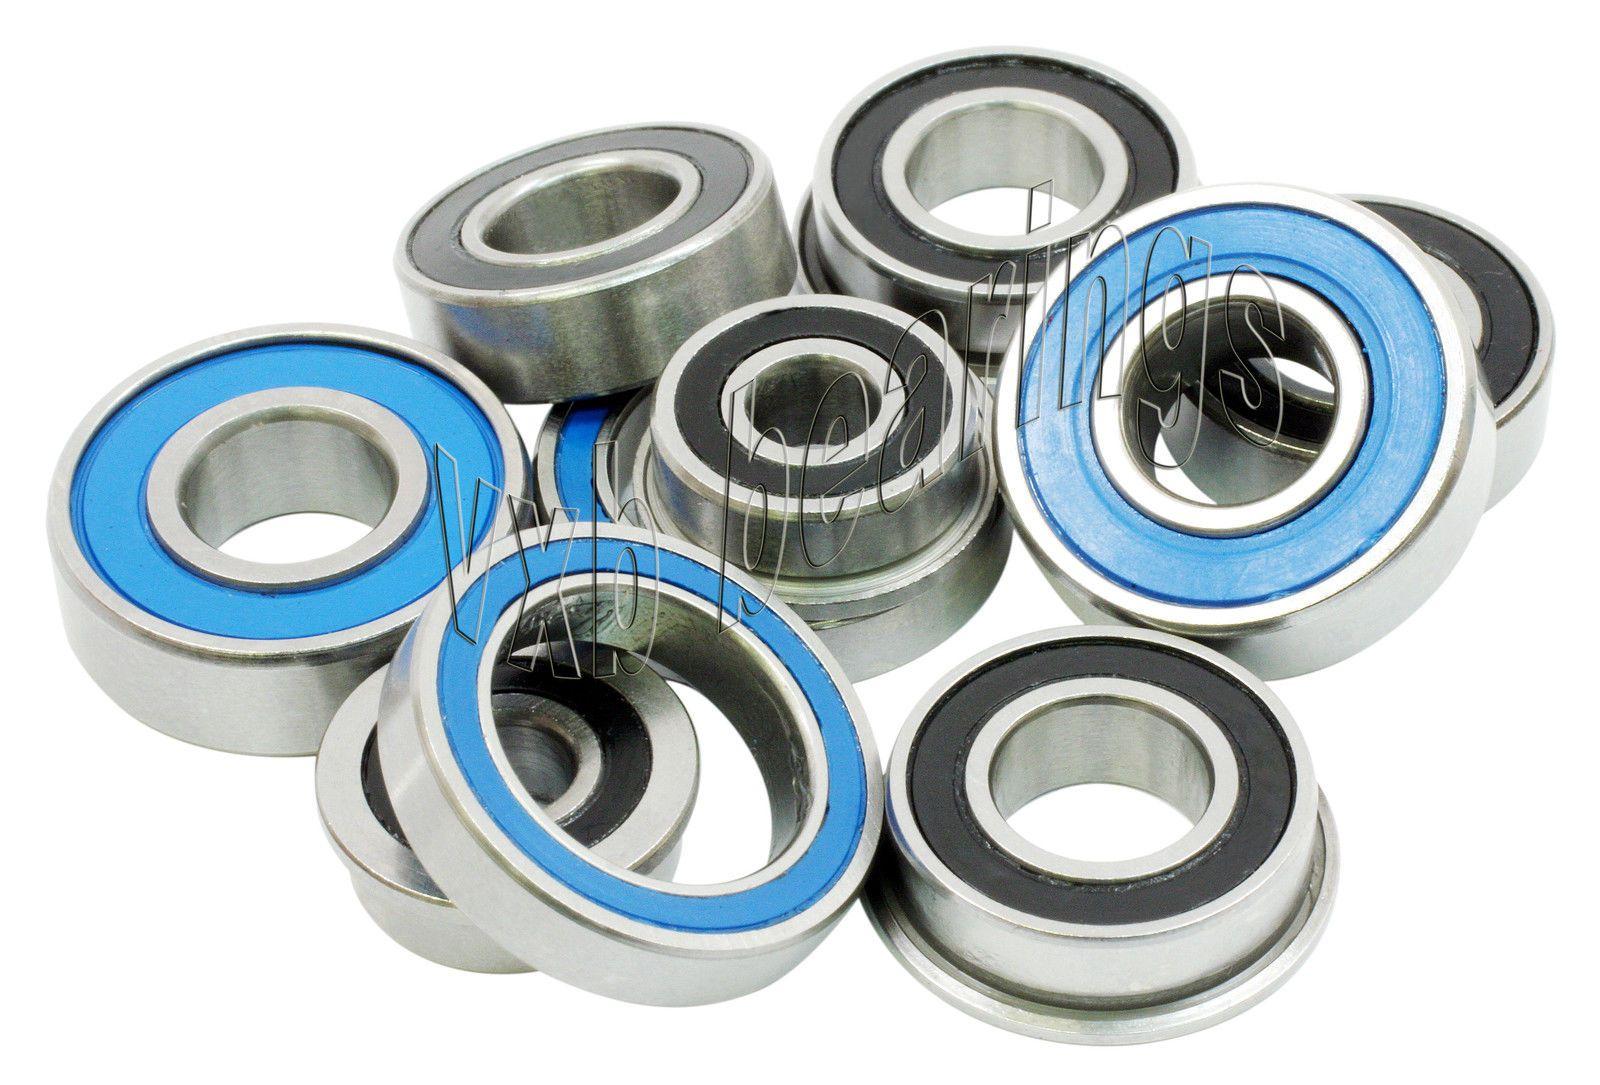 Tamiya Hornet 1//10 Electric Off-rd Bearing set Quality Ball Bearings